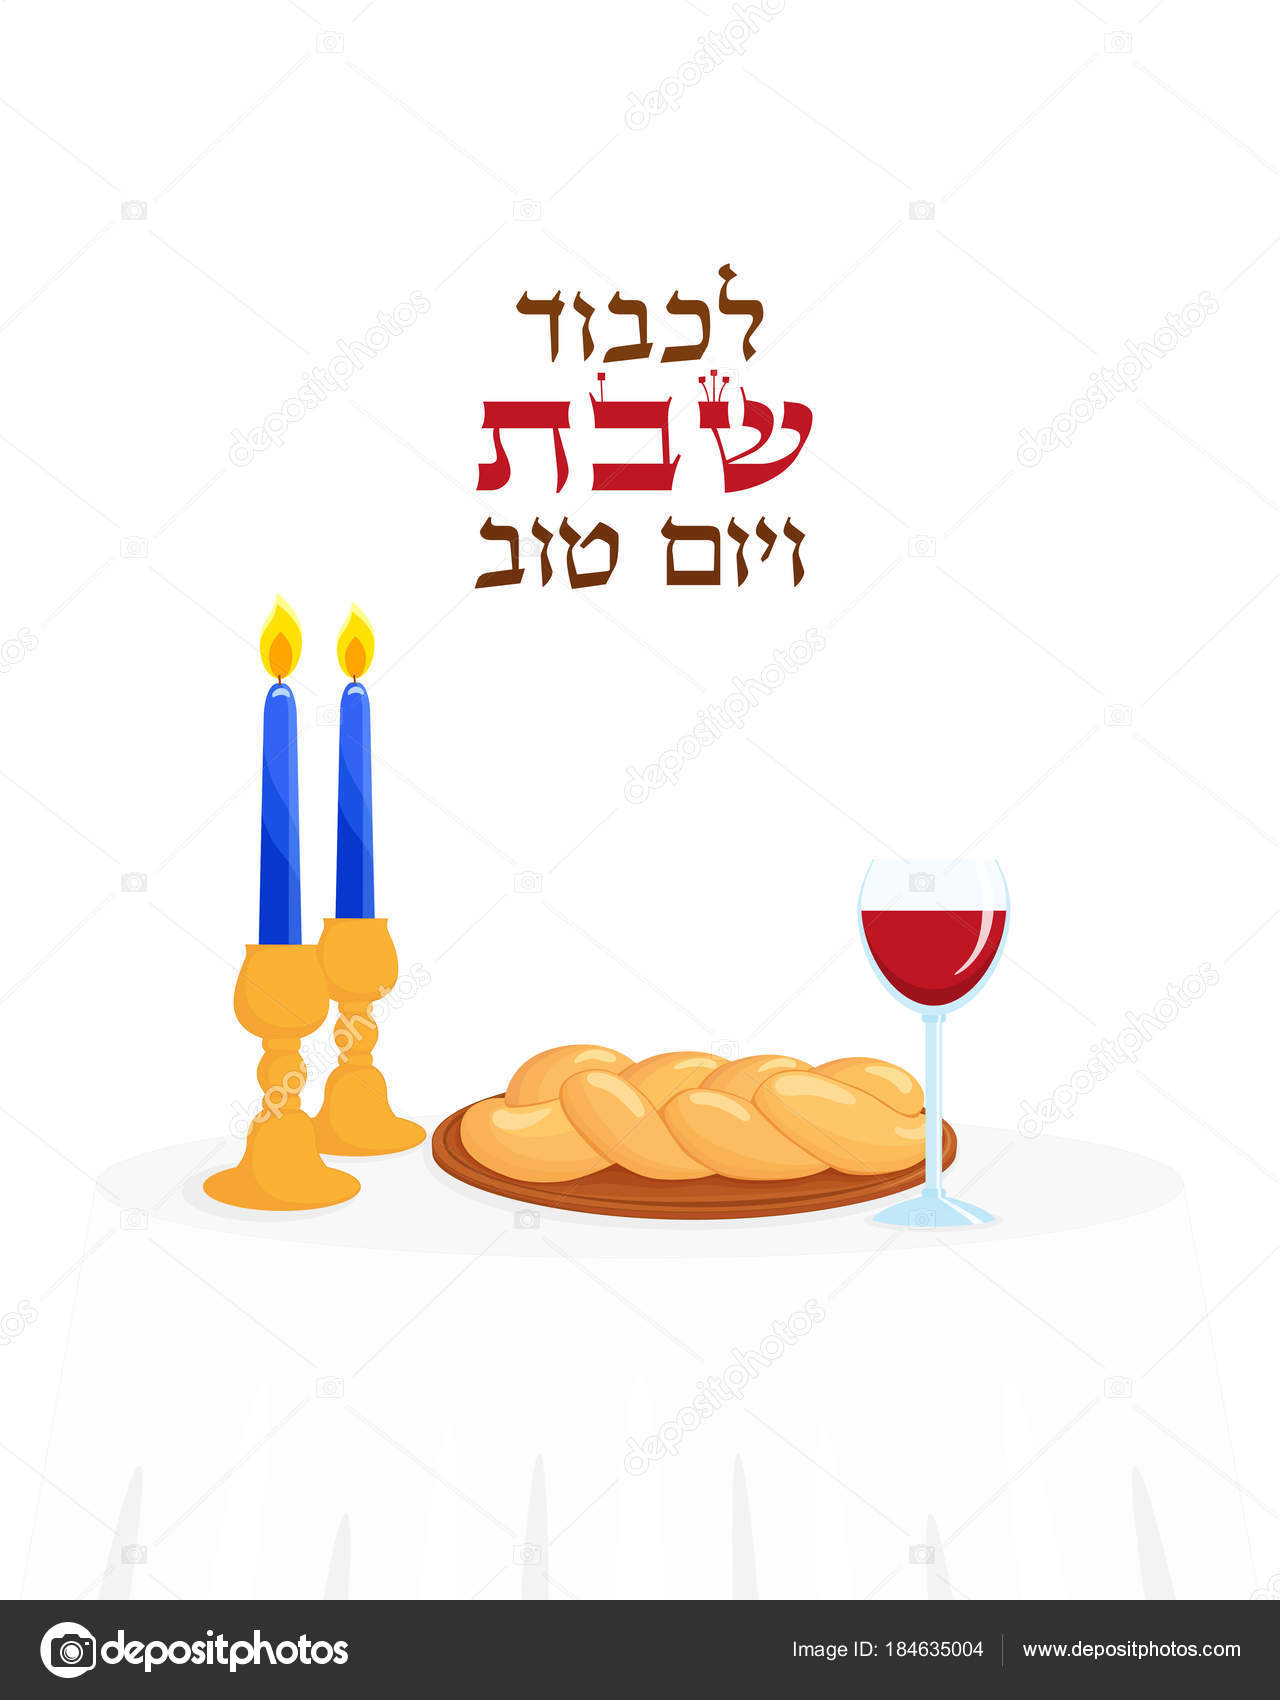 Jewish Shabbat Jewish Holiday Symbols And Greeting Inscription